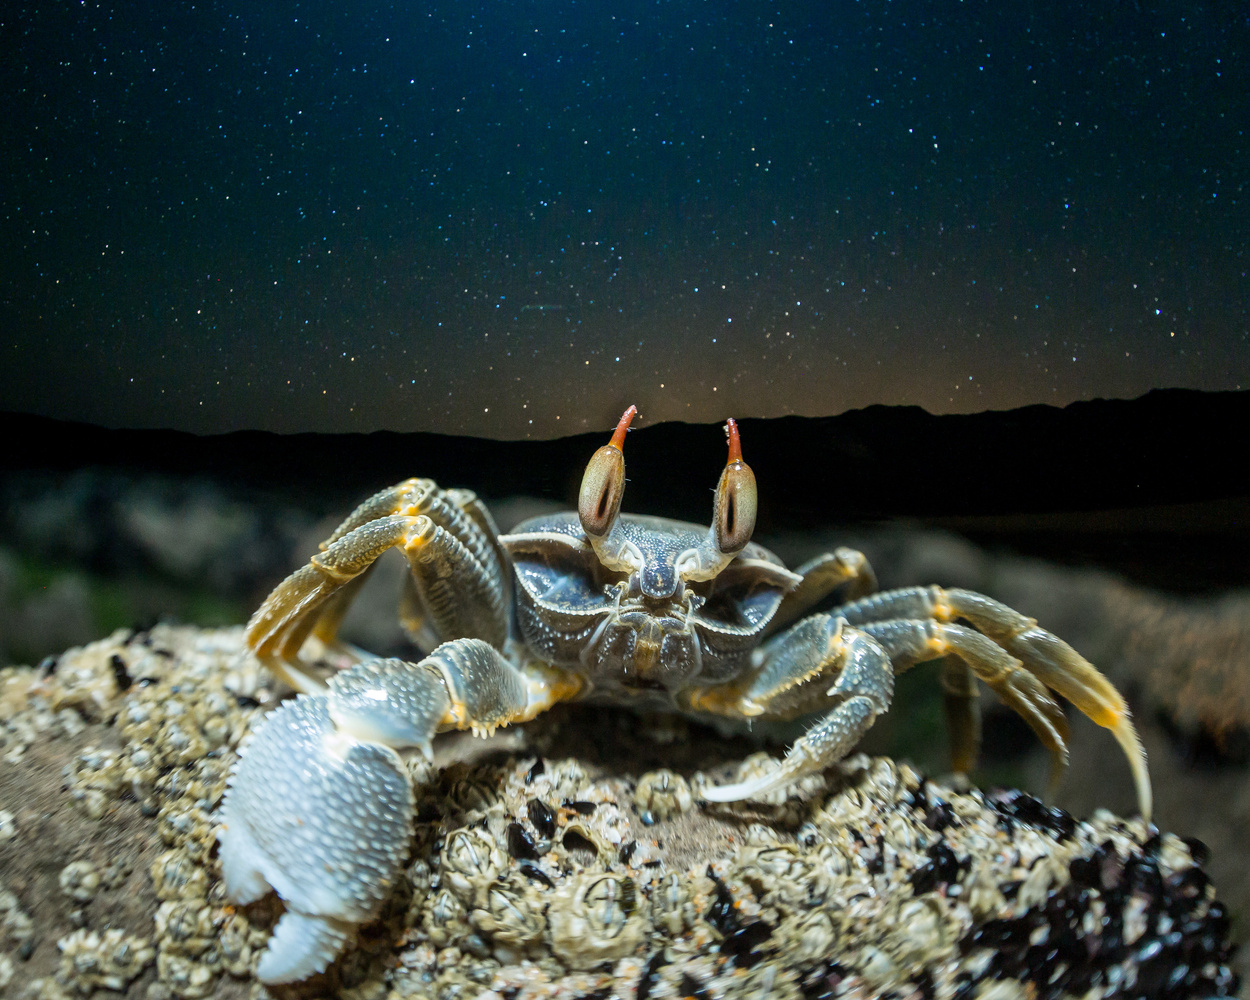 Ghost Crab by Daniel van Duinkerken